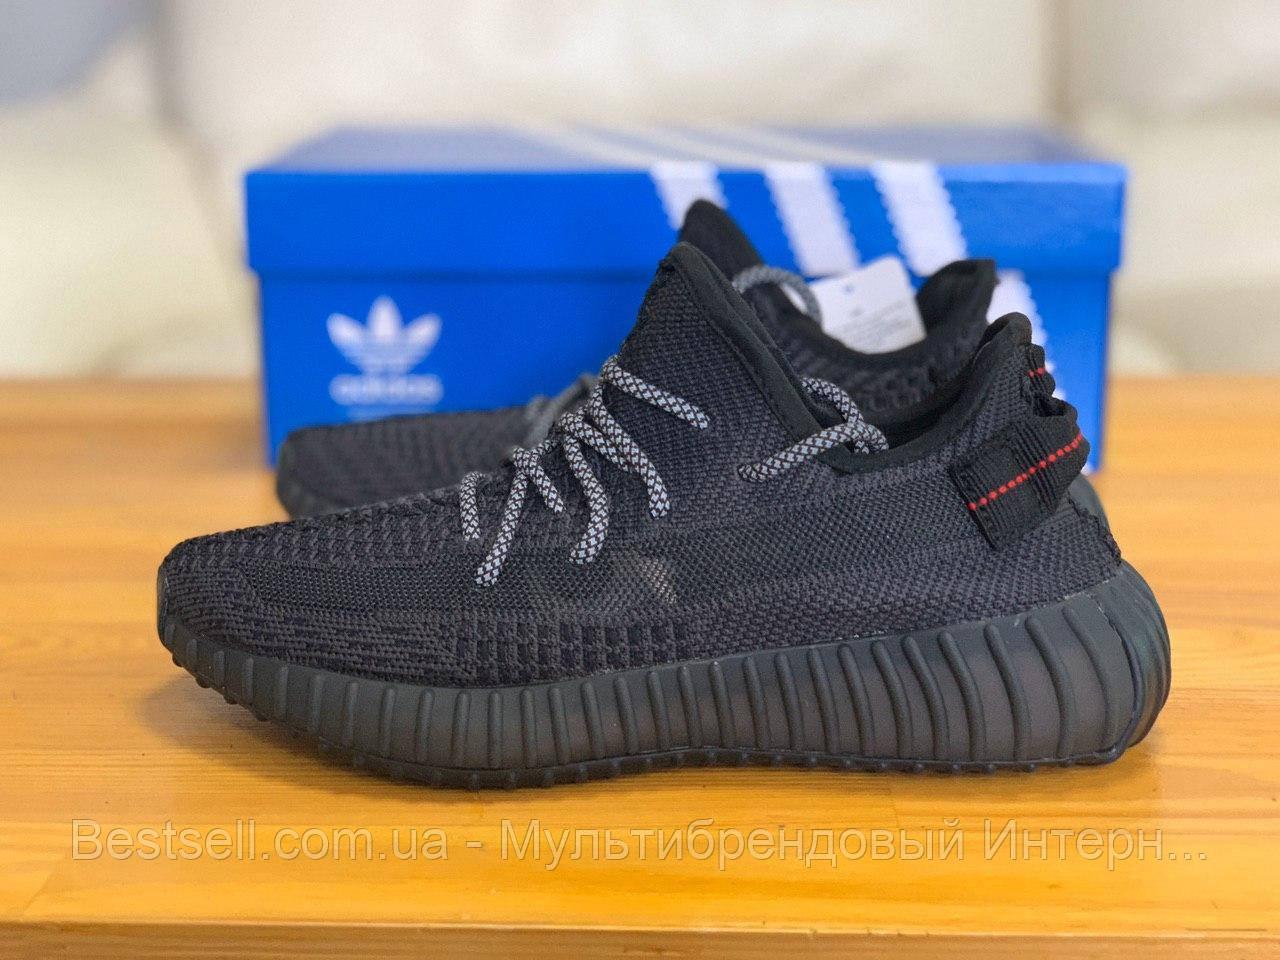 Кросівки Adidas Yeezy Boost 350 V2 Адідас Ізі Буст В2 ⏩ (36,37,38,40)